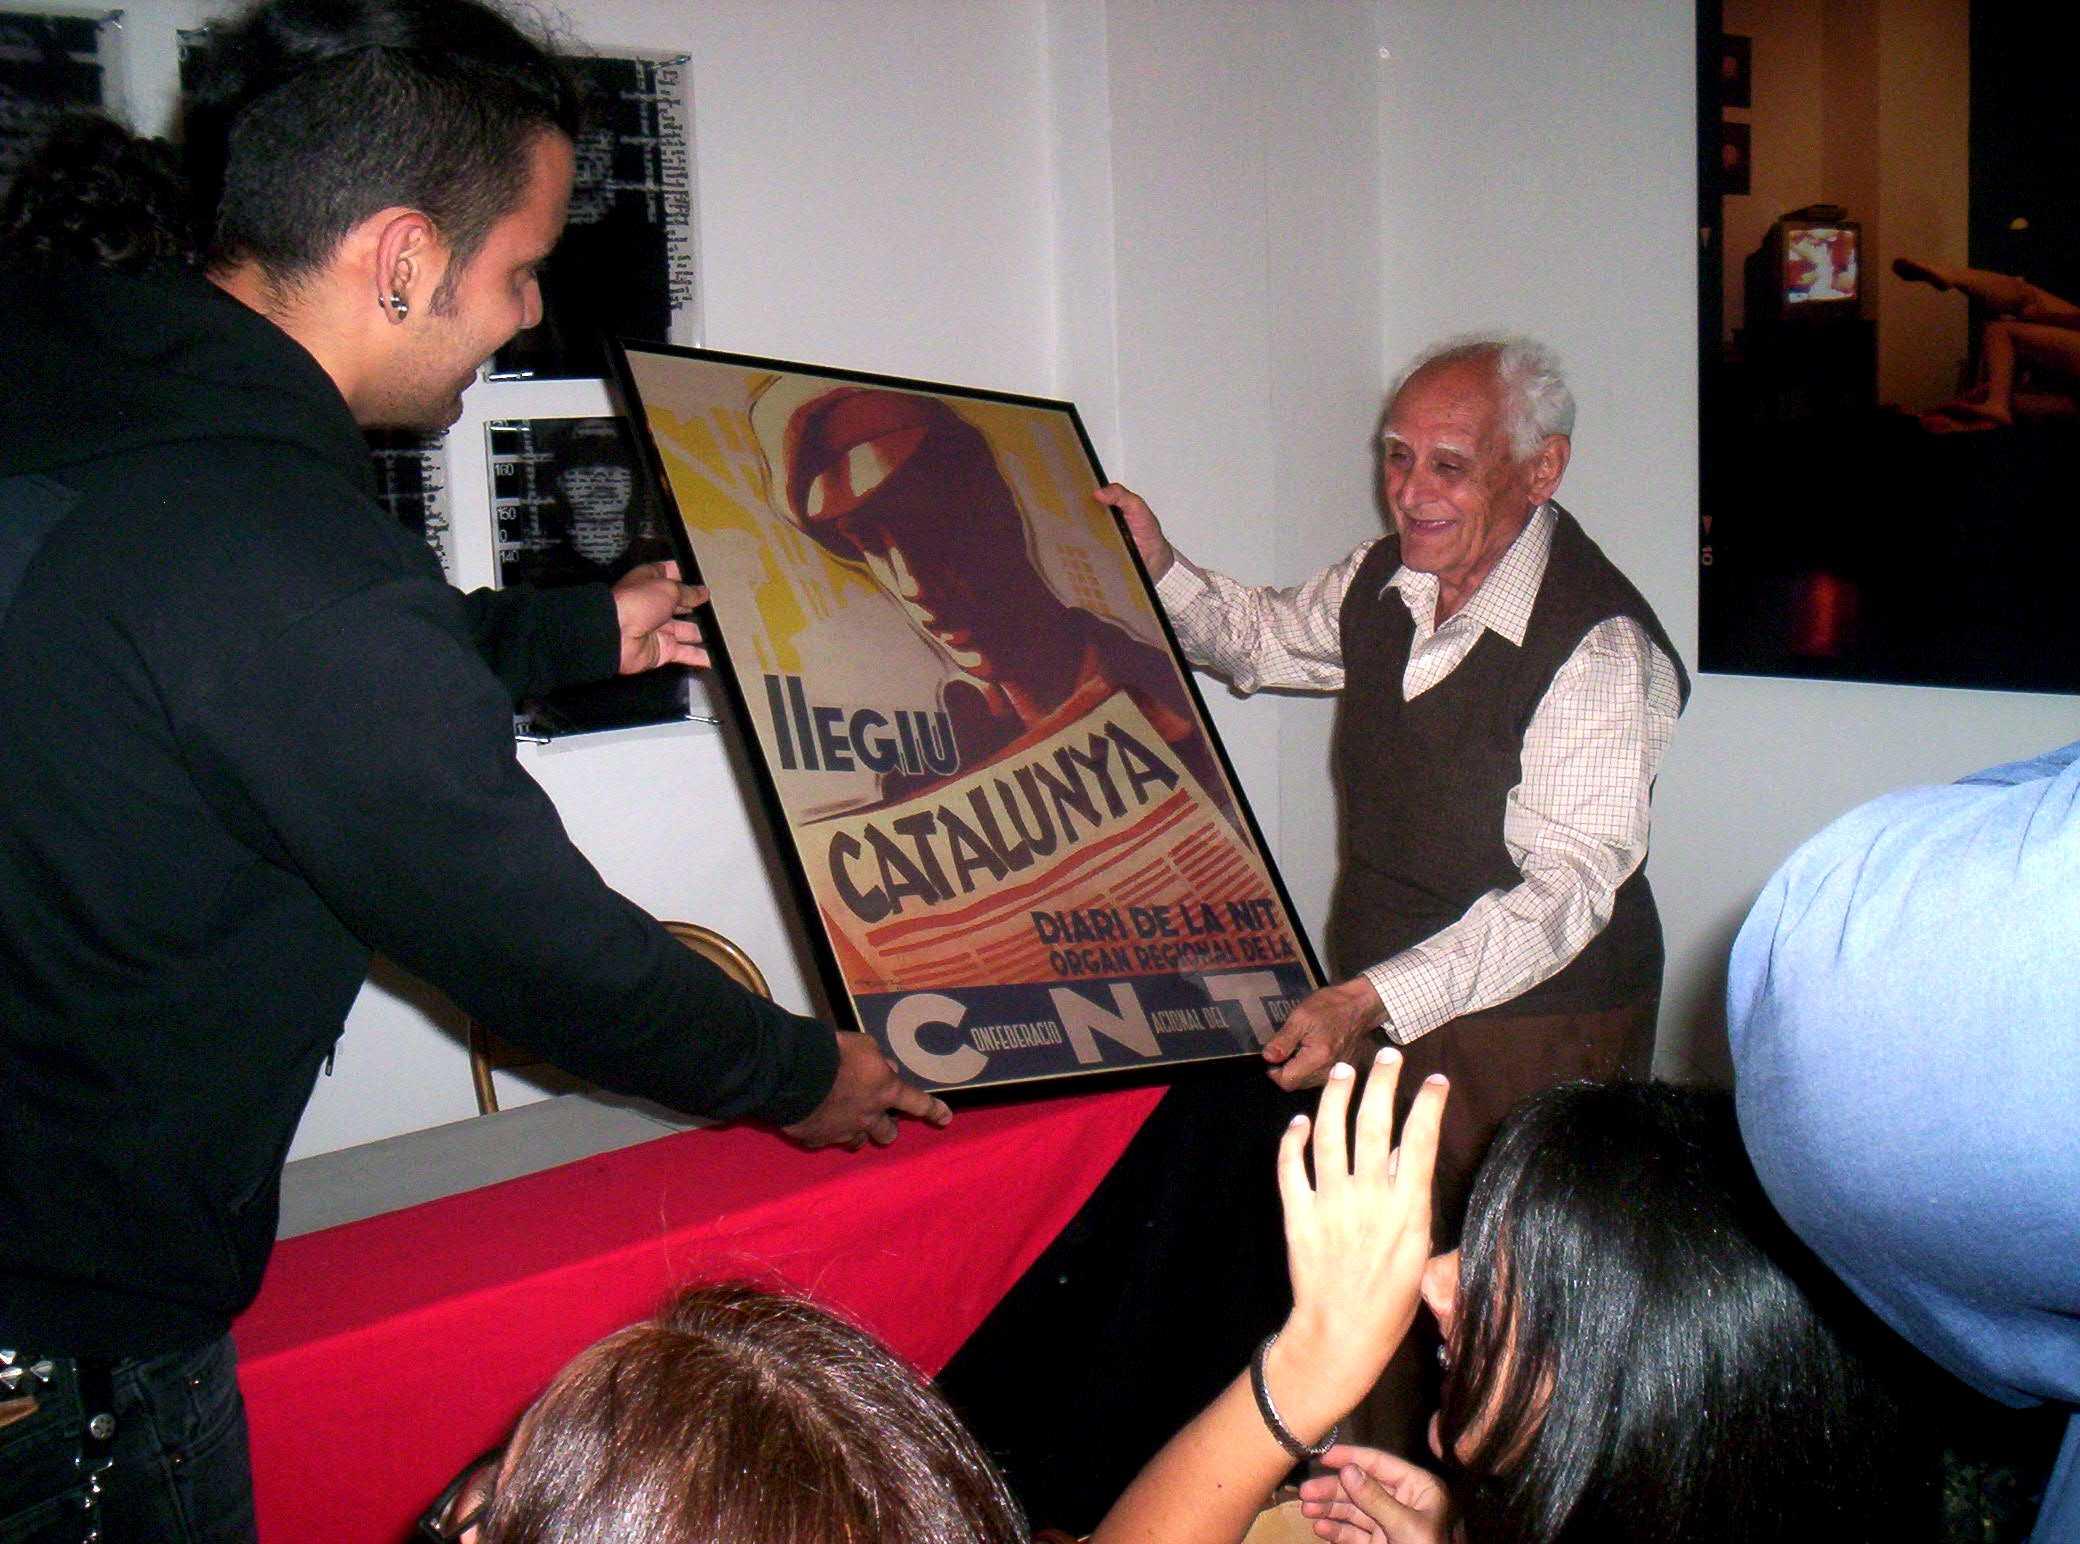 Homenatge a Antonio Serrano González (Caracas, julio 2005)